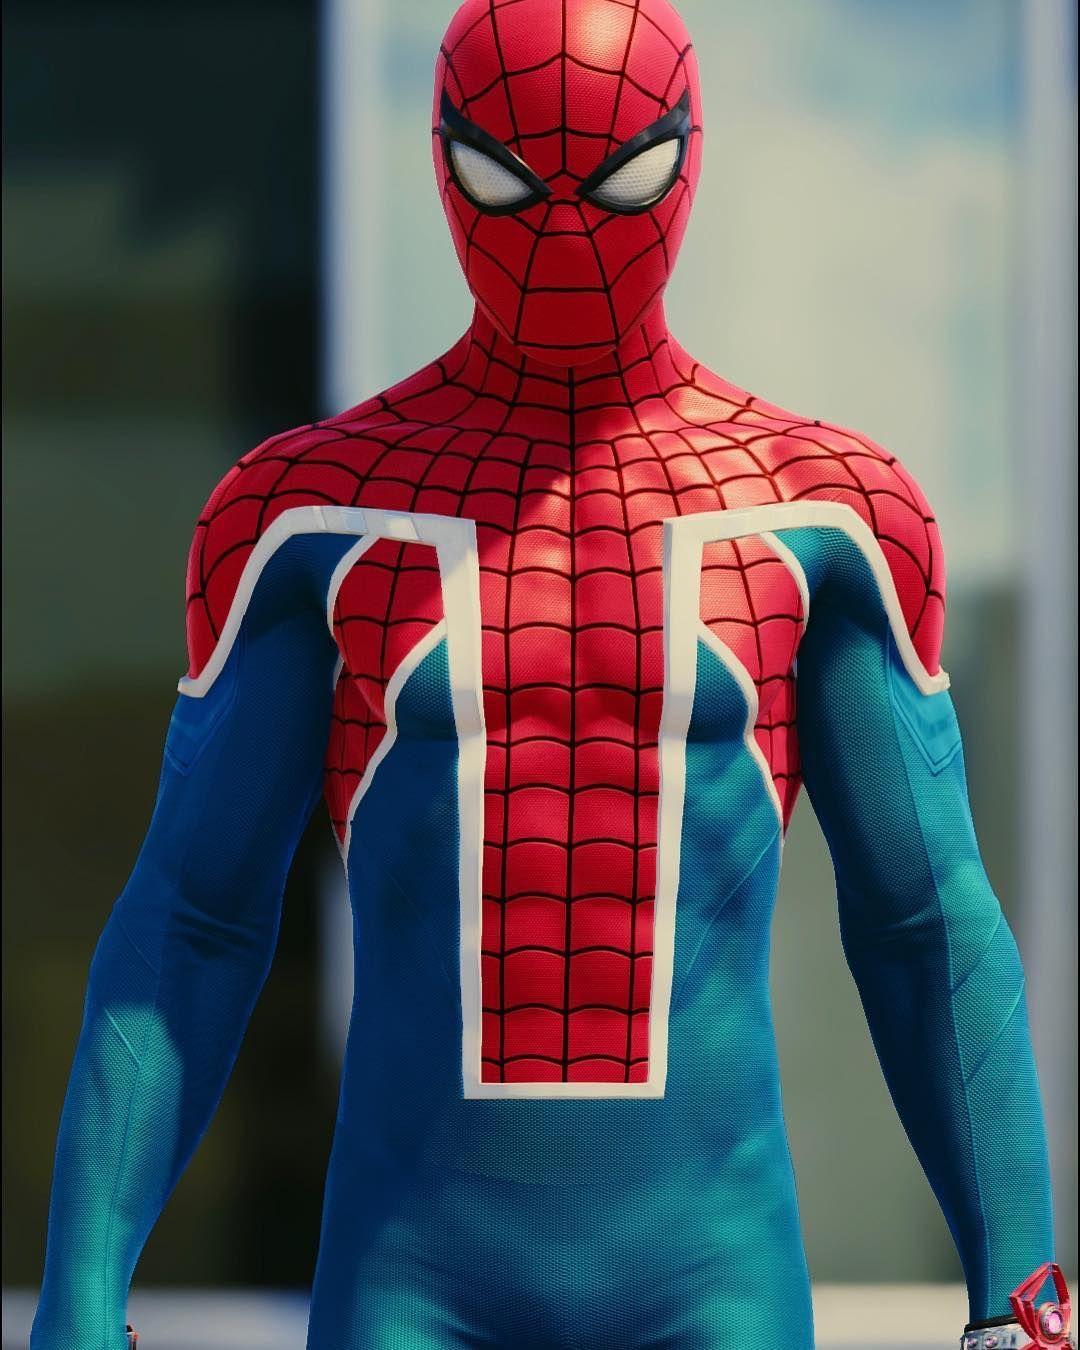 Spidey Suit Series; Spider-UK Suit 📸 #Gametography # ...